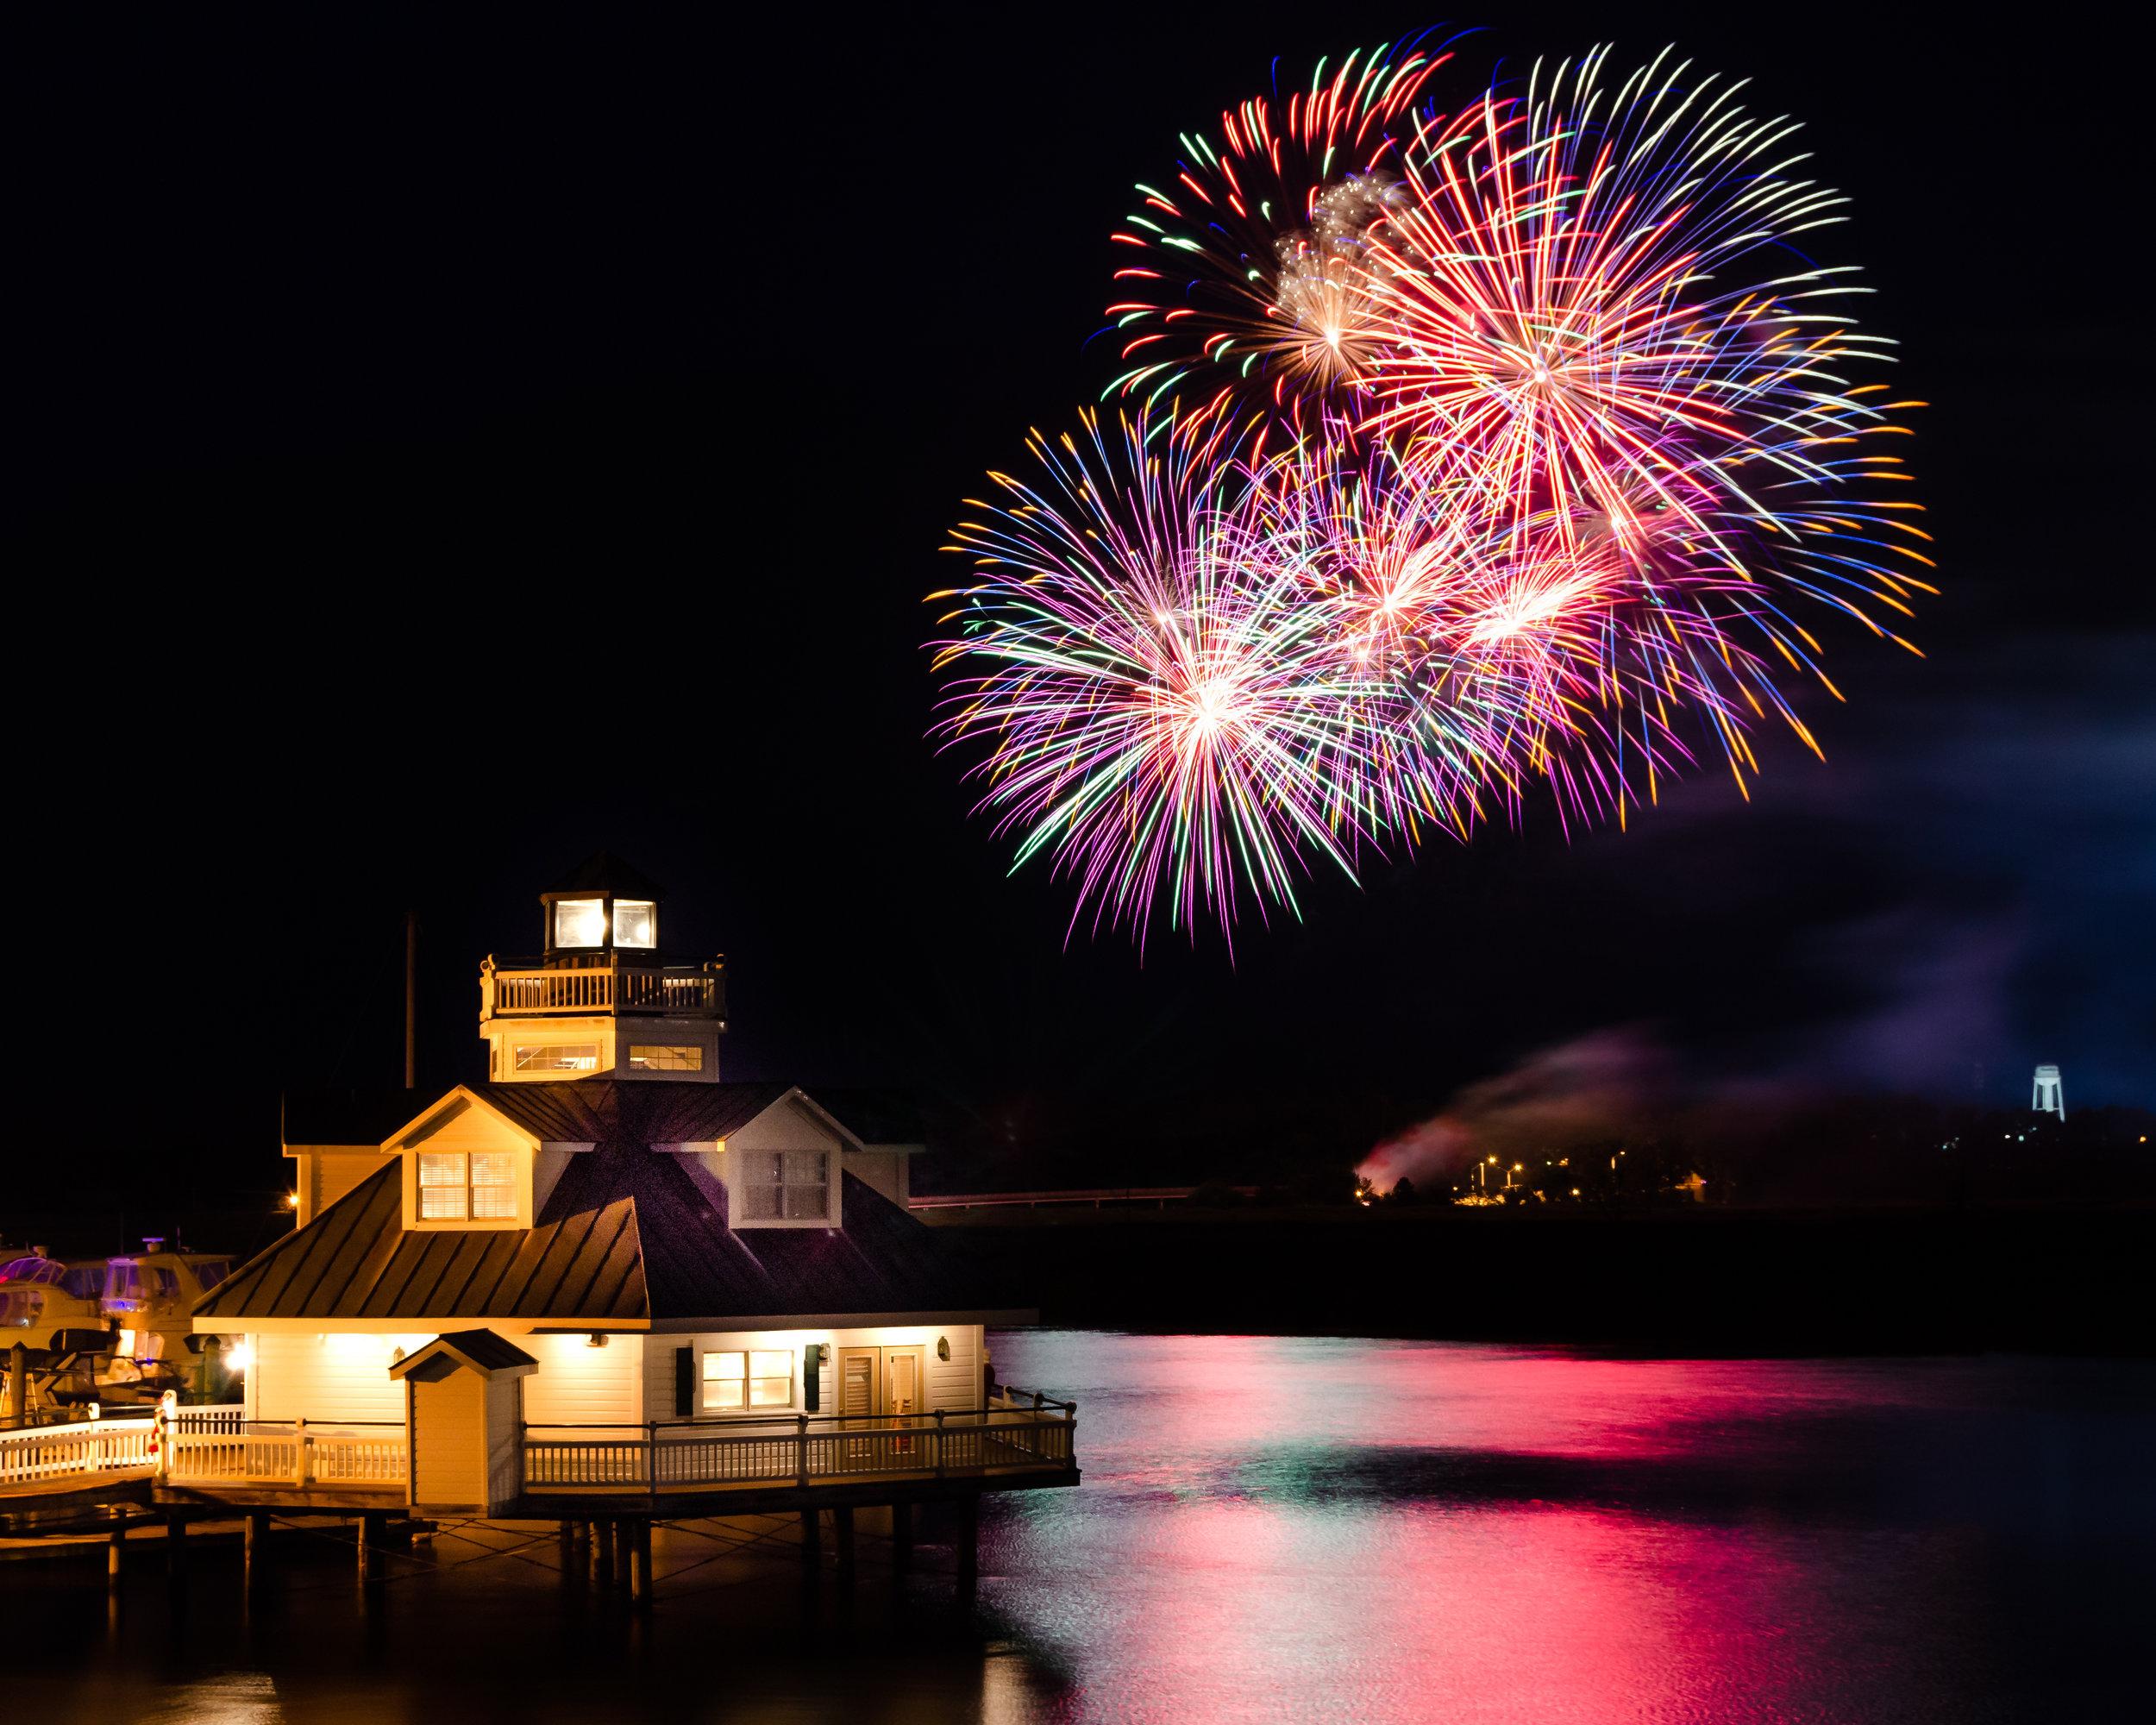 Smithfield-Virginia-fireworks-4th of July-Smithfield Station-water.JPG